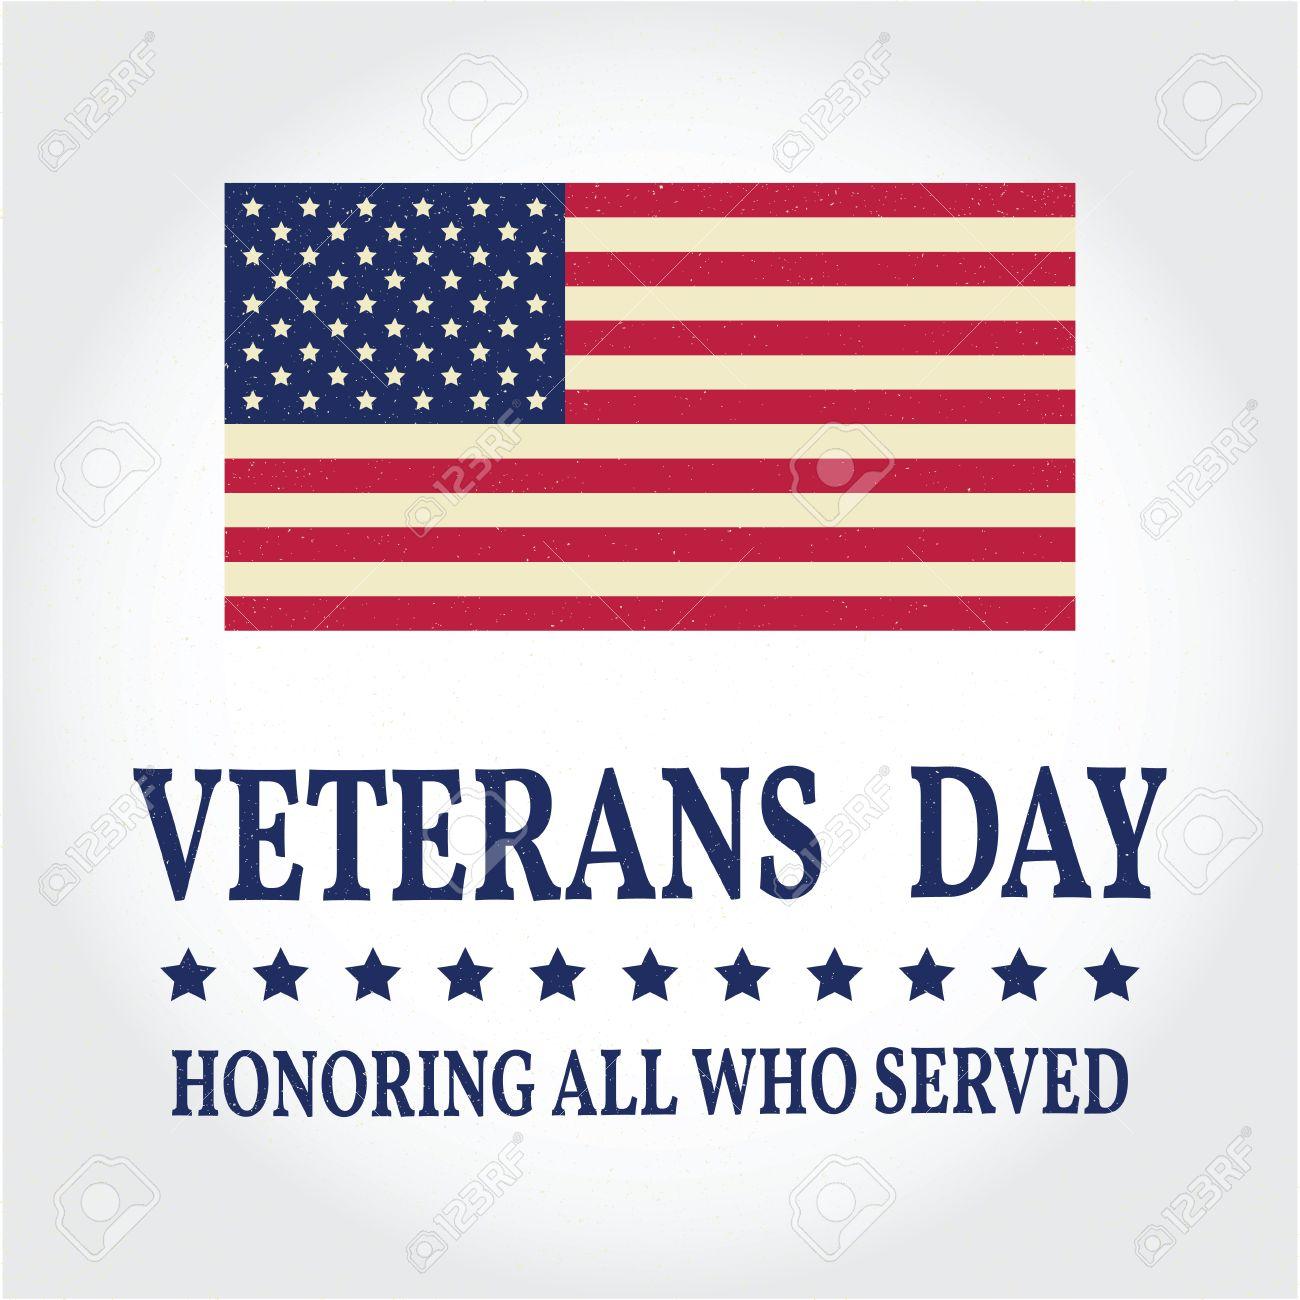 1300x1300 Veterans Day.veterans Day Vector. Veterans Day Drawing. Veterans